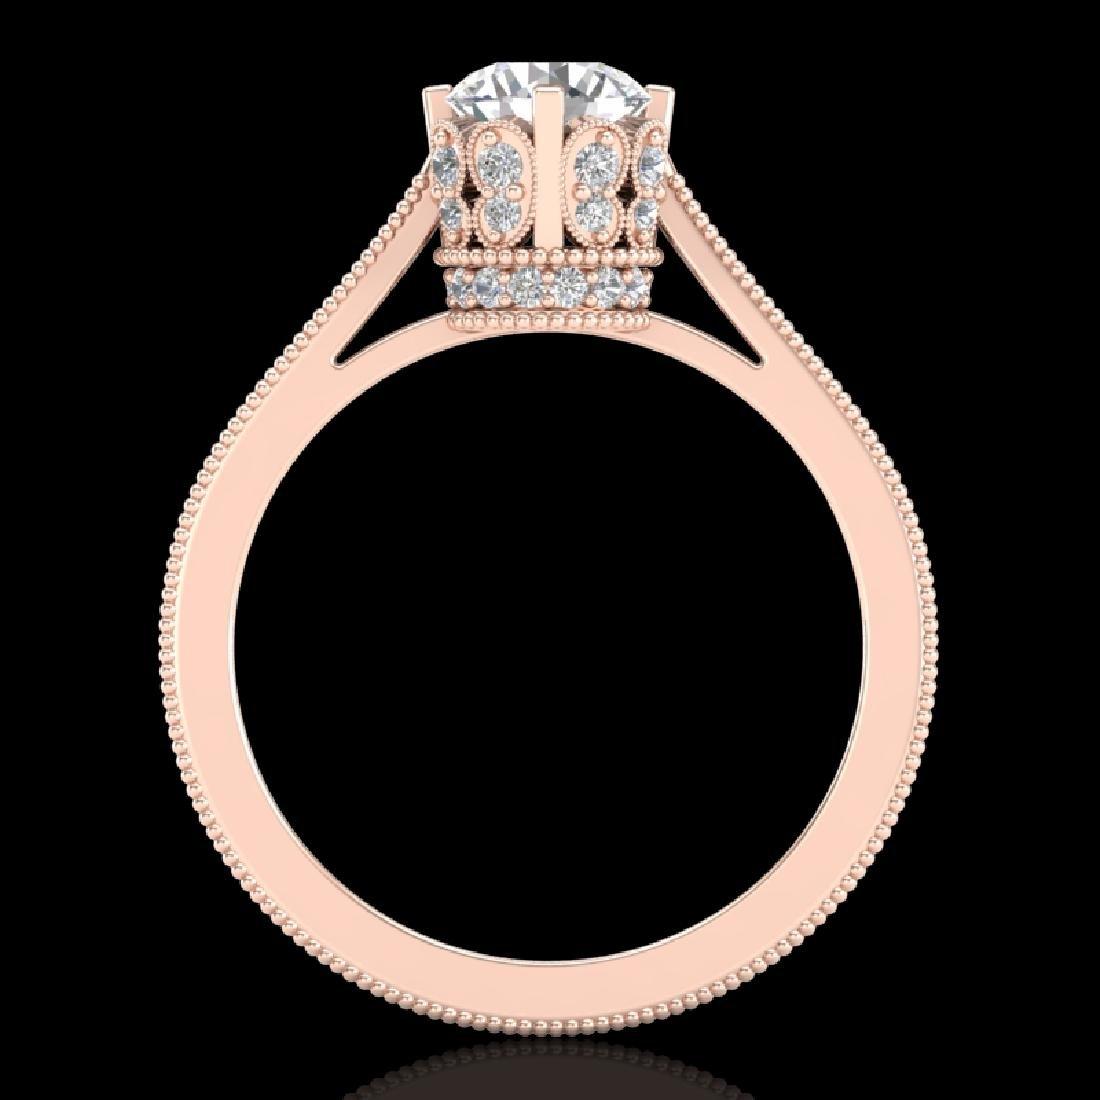 1.14 CTW VS/SI Diamond Solitaire Art Deco Ring 18K Rose - 2